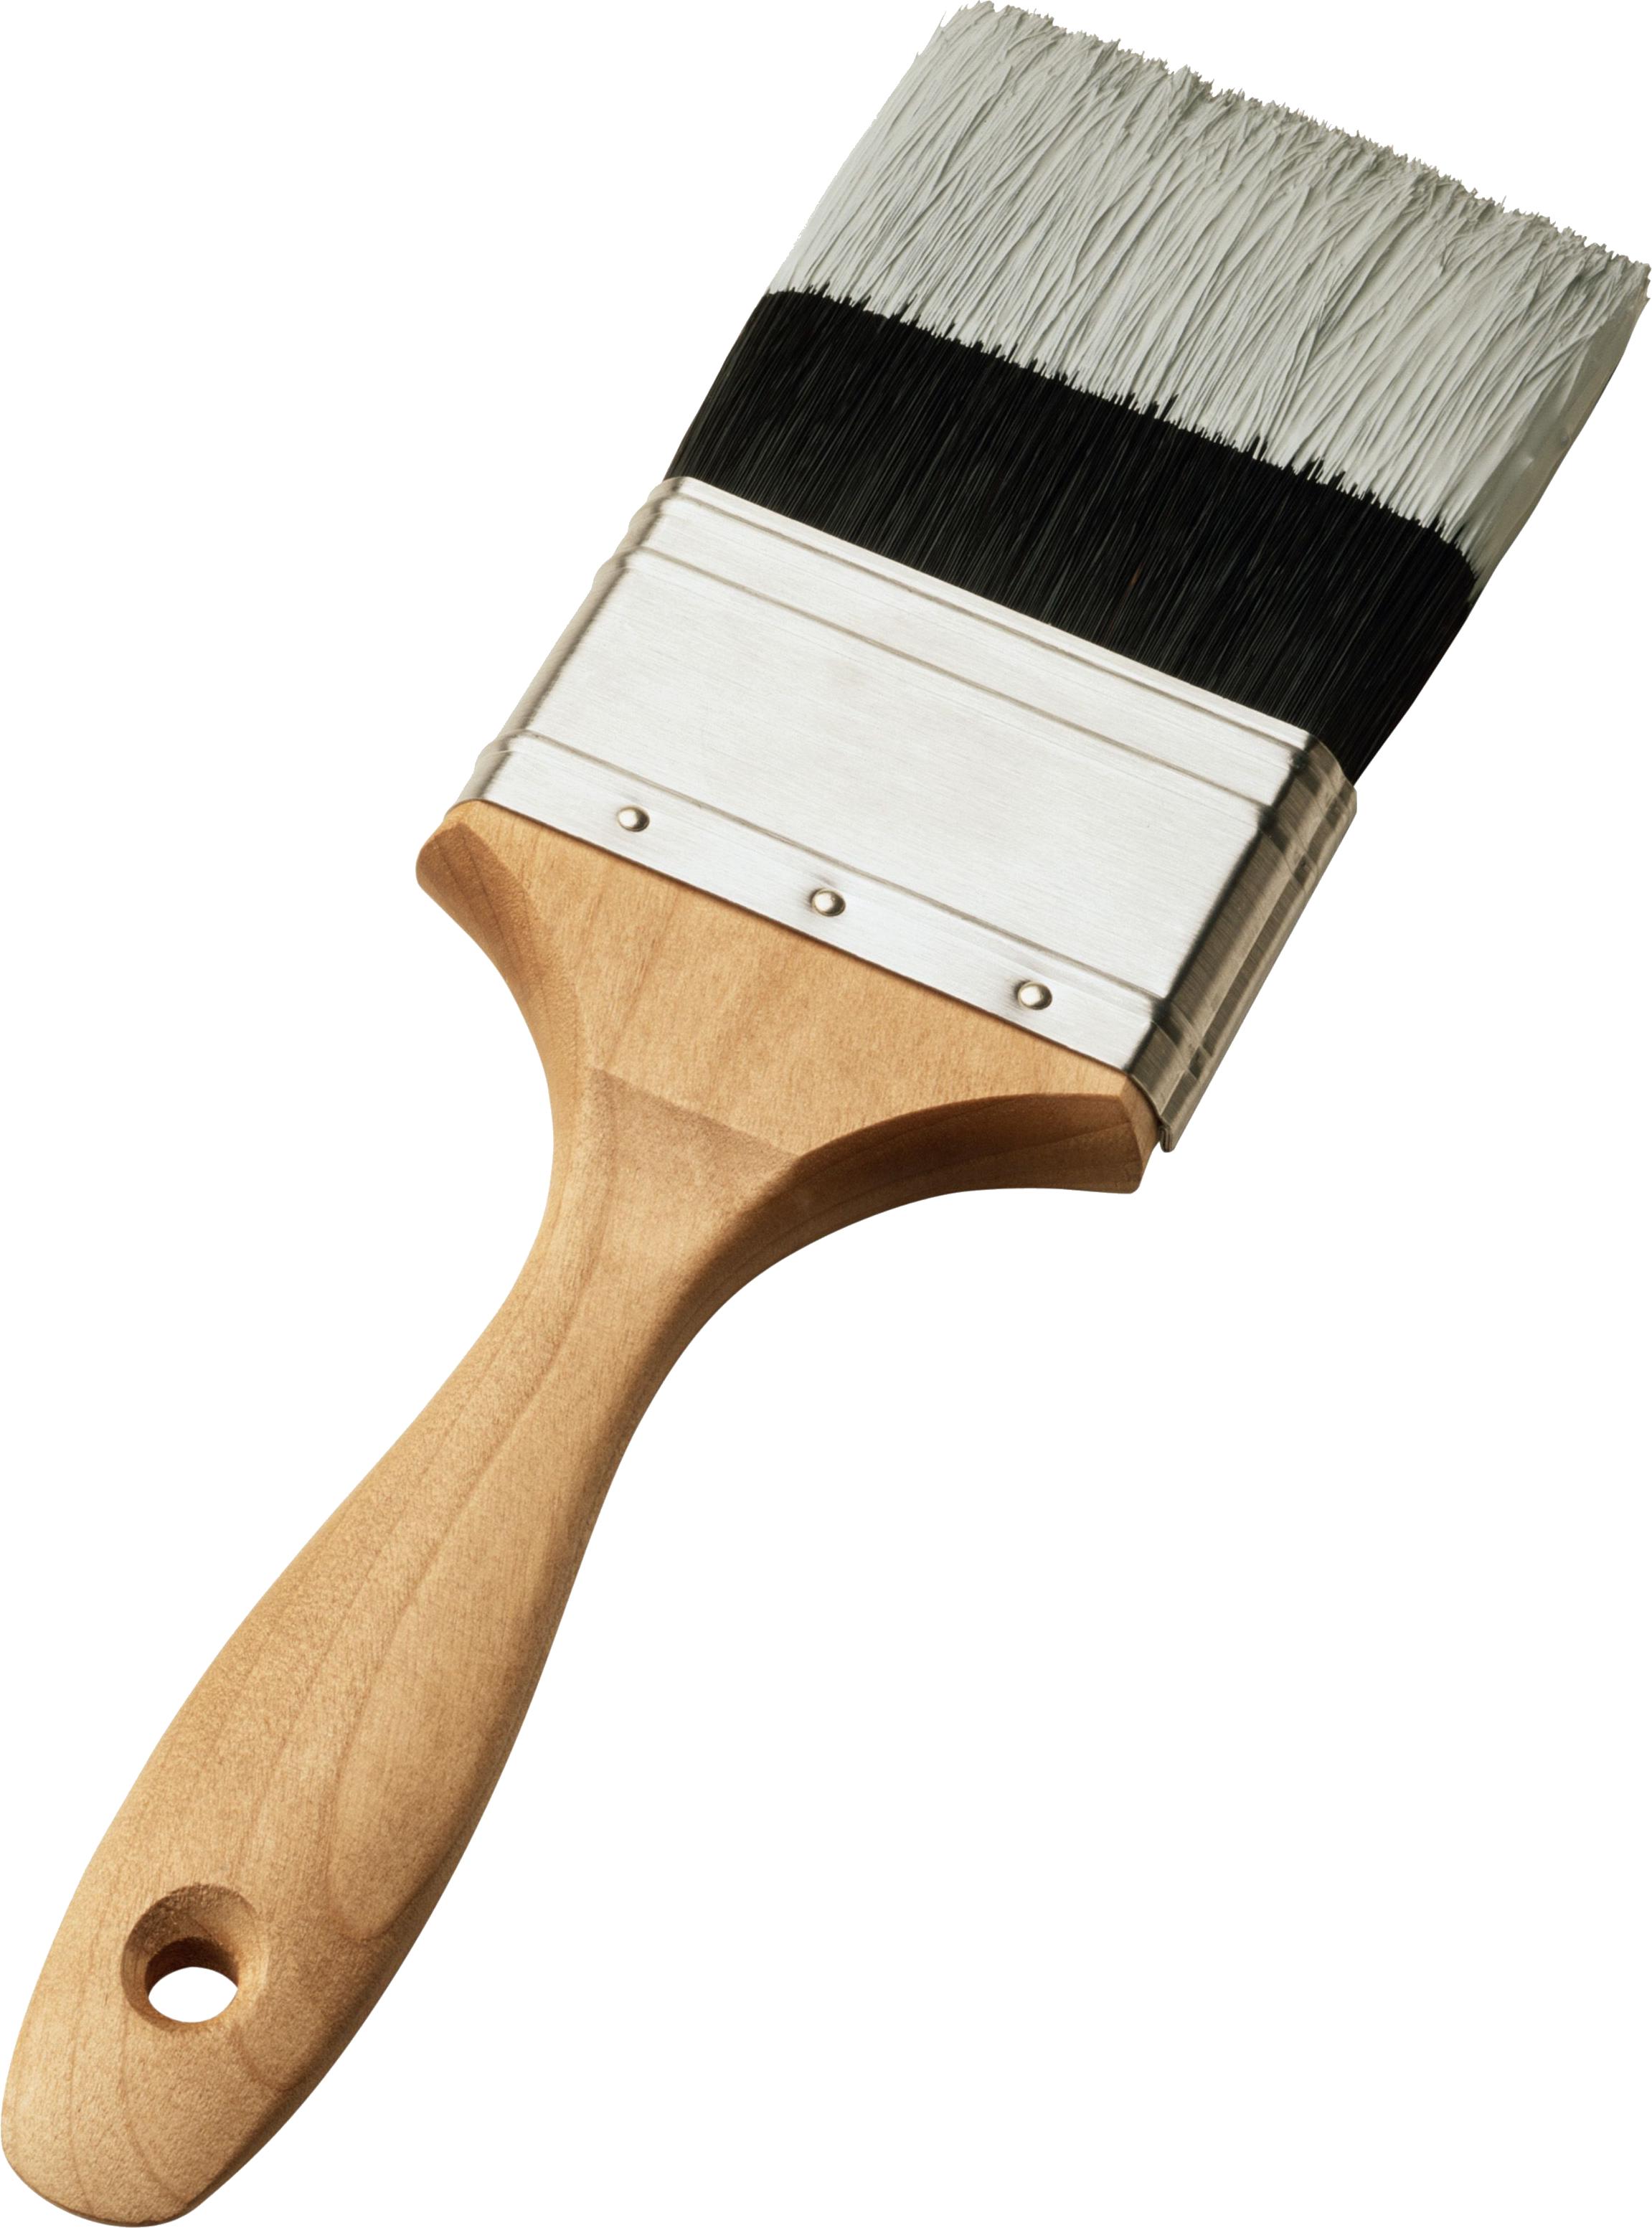 Brush Hair Design